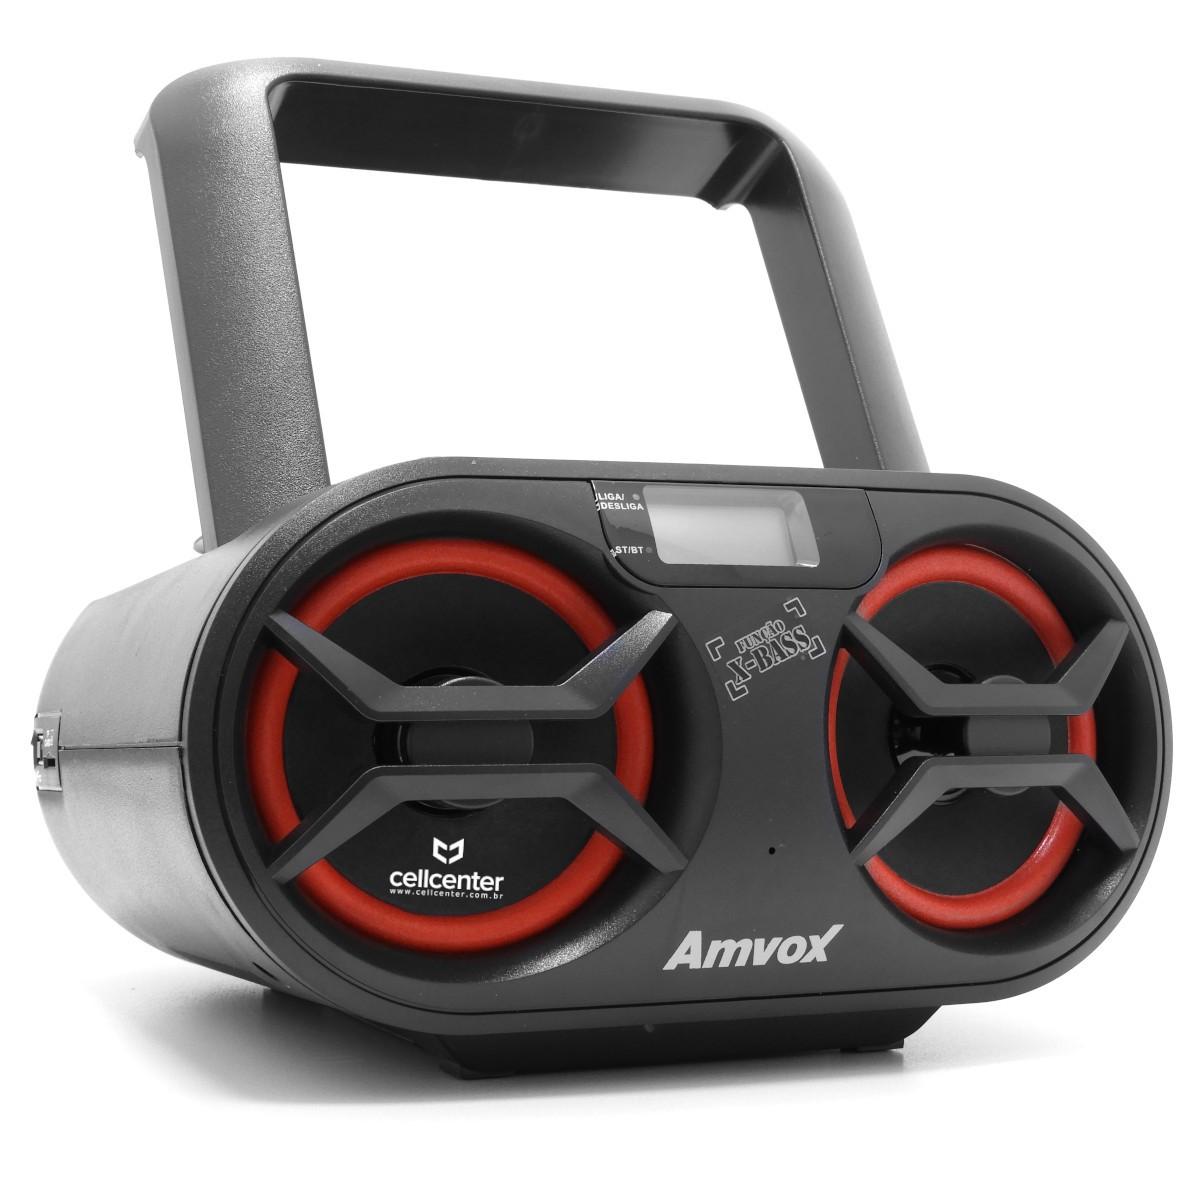 Rádio Boombox Som Cd Mp3 Player Usb Sd Fm Am Amvox AMC-590 New